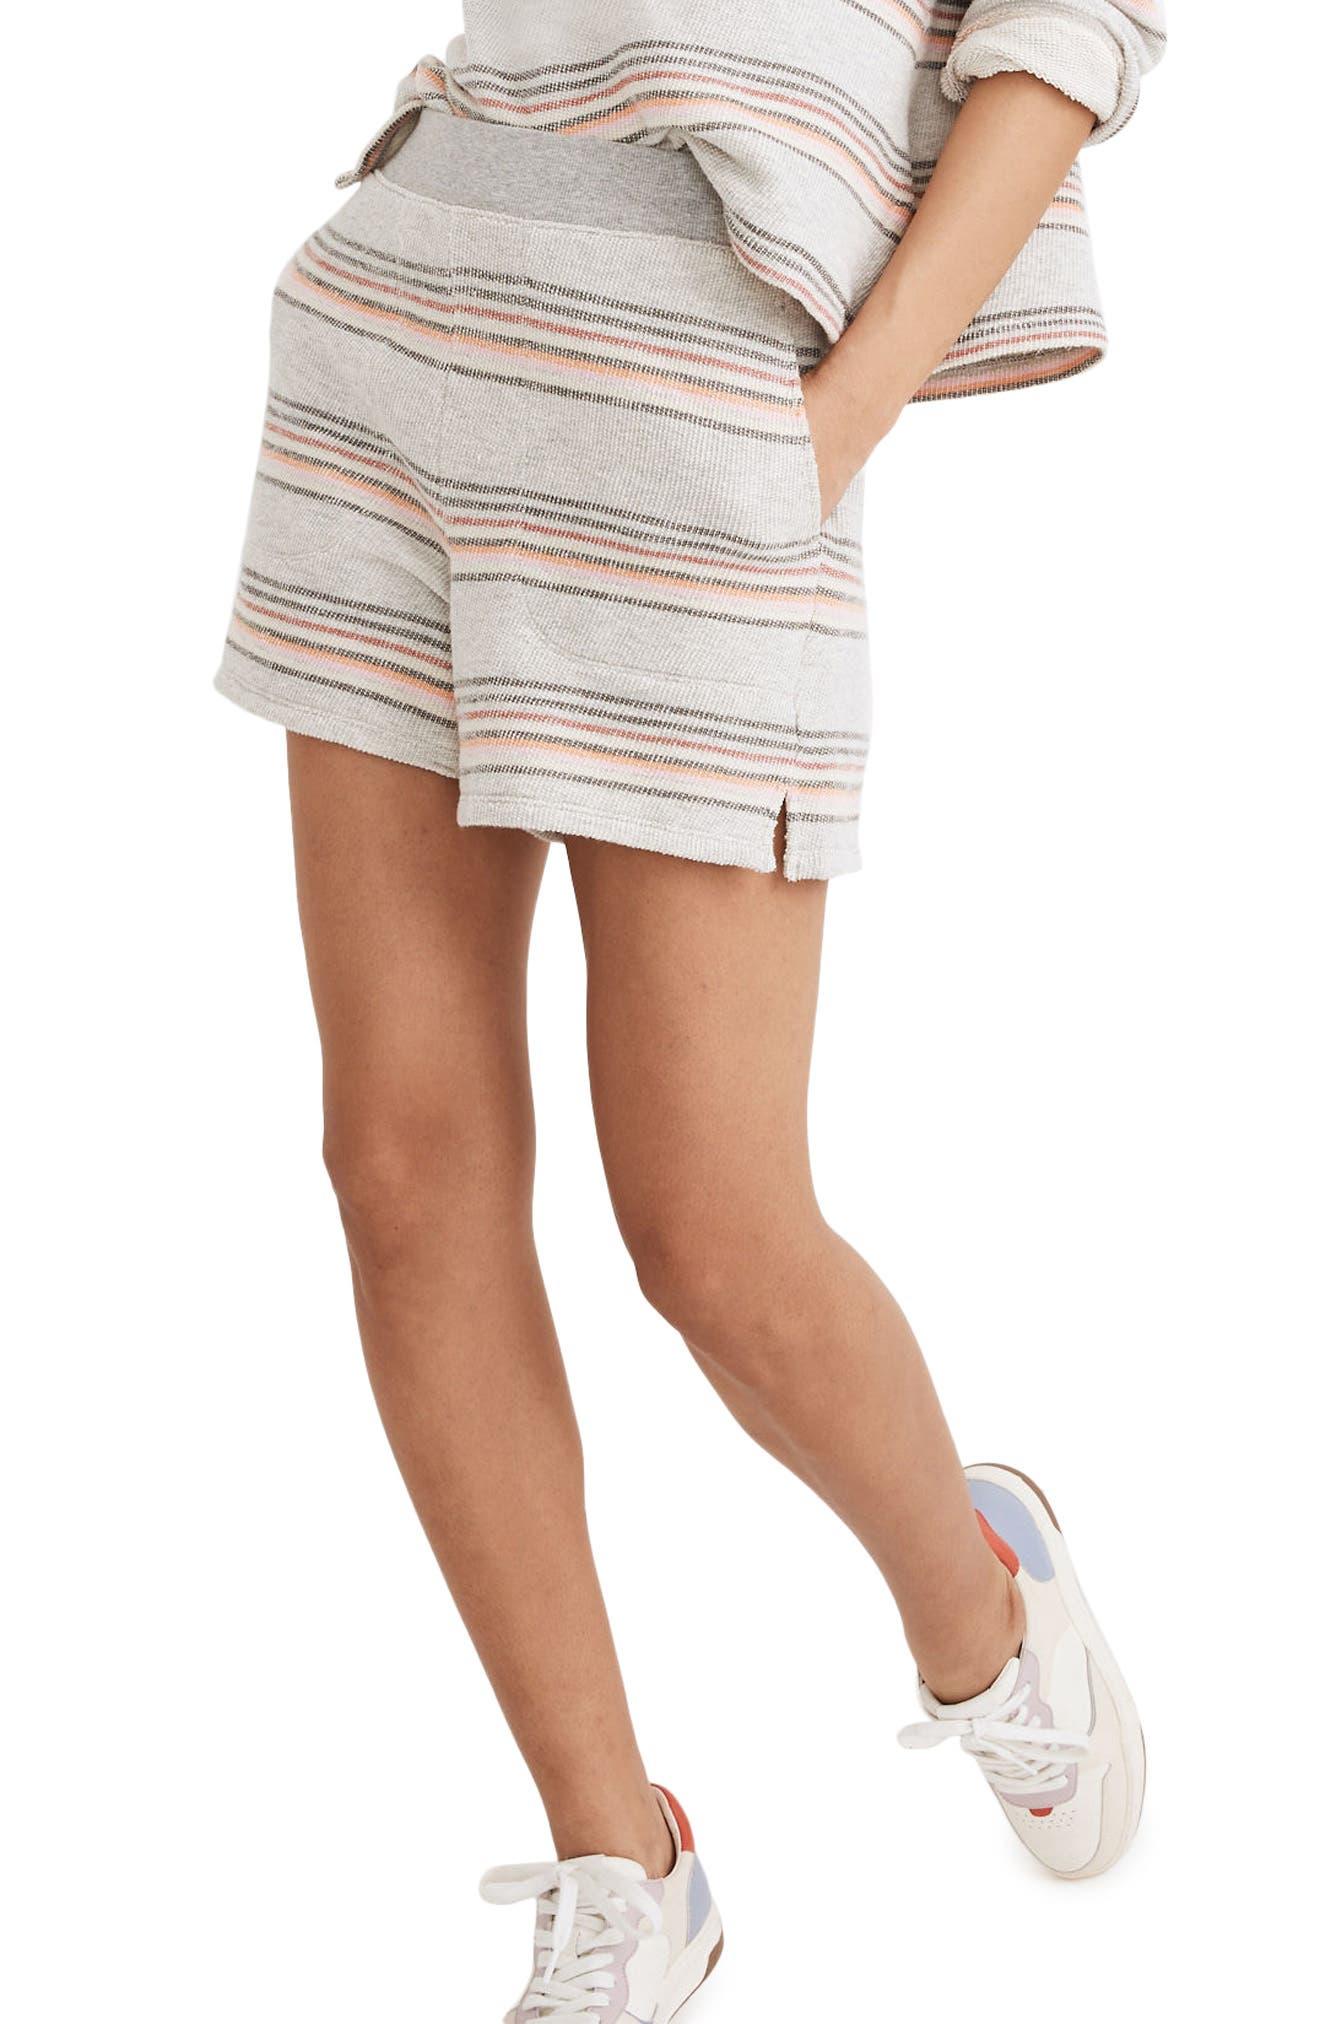 Stitched Pocket Sweat Shorts